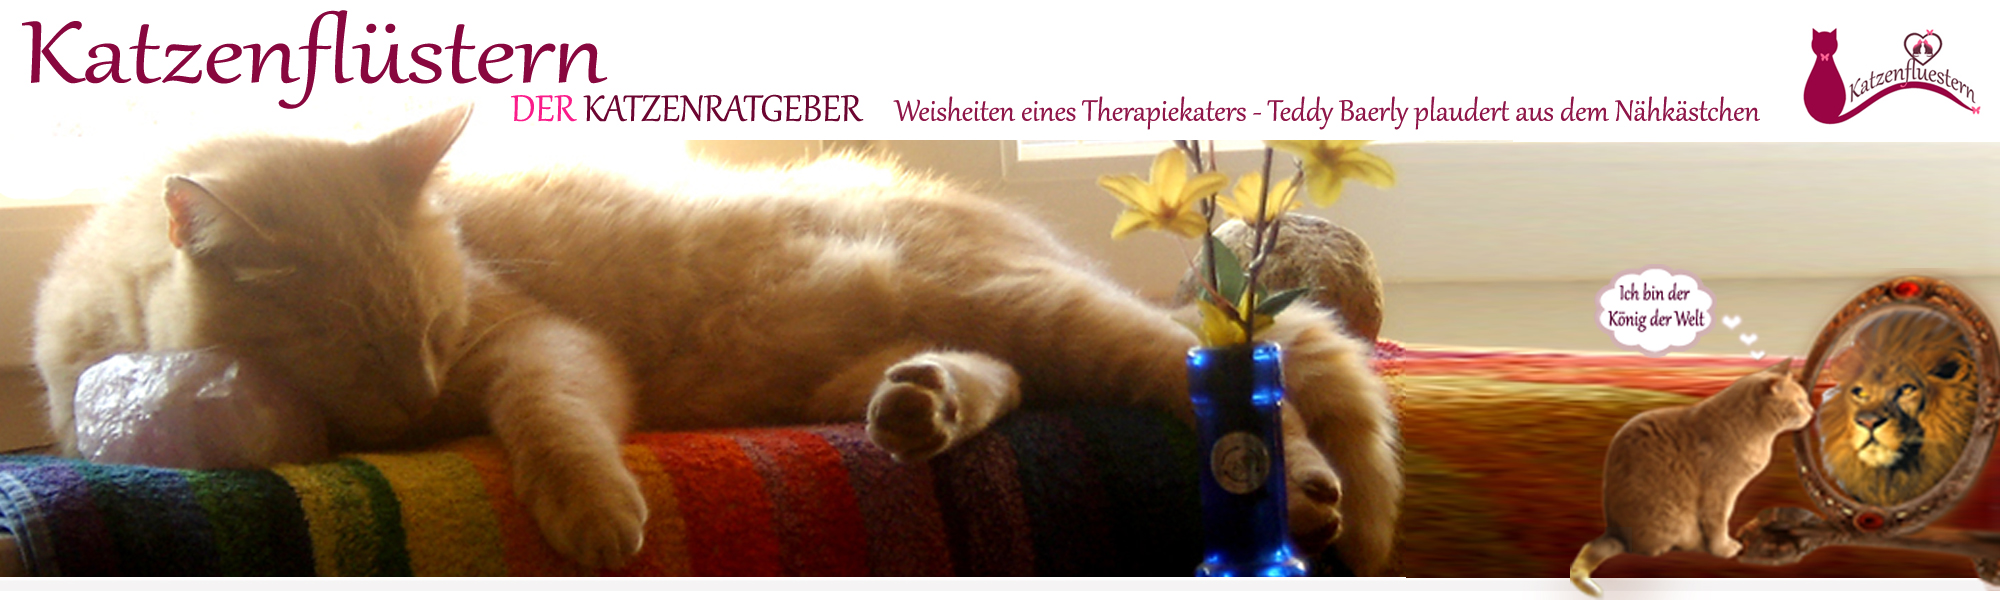 Katzenflüstern – Katzenpsychologin und Katzenratgeber